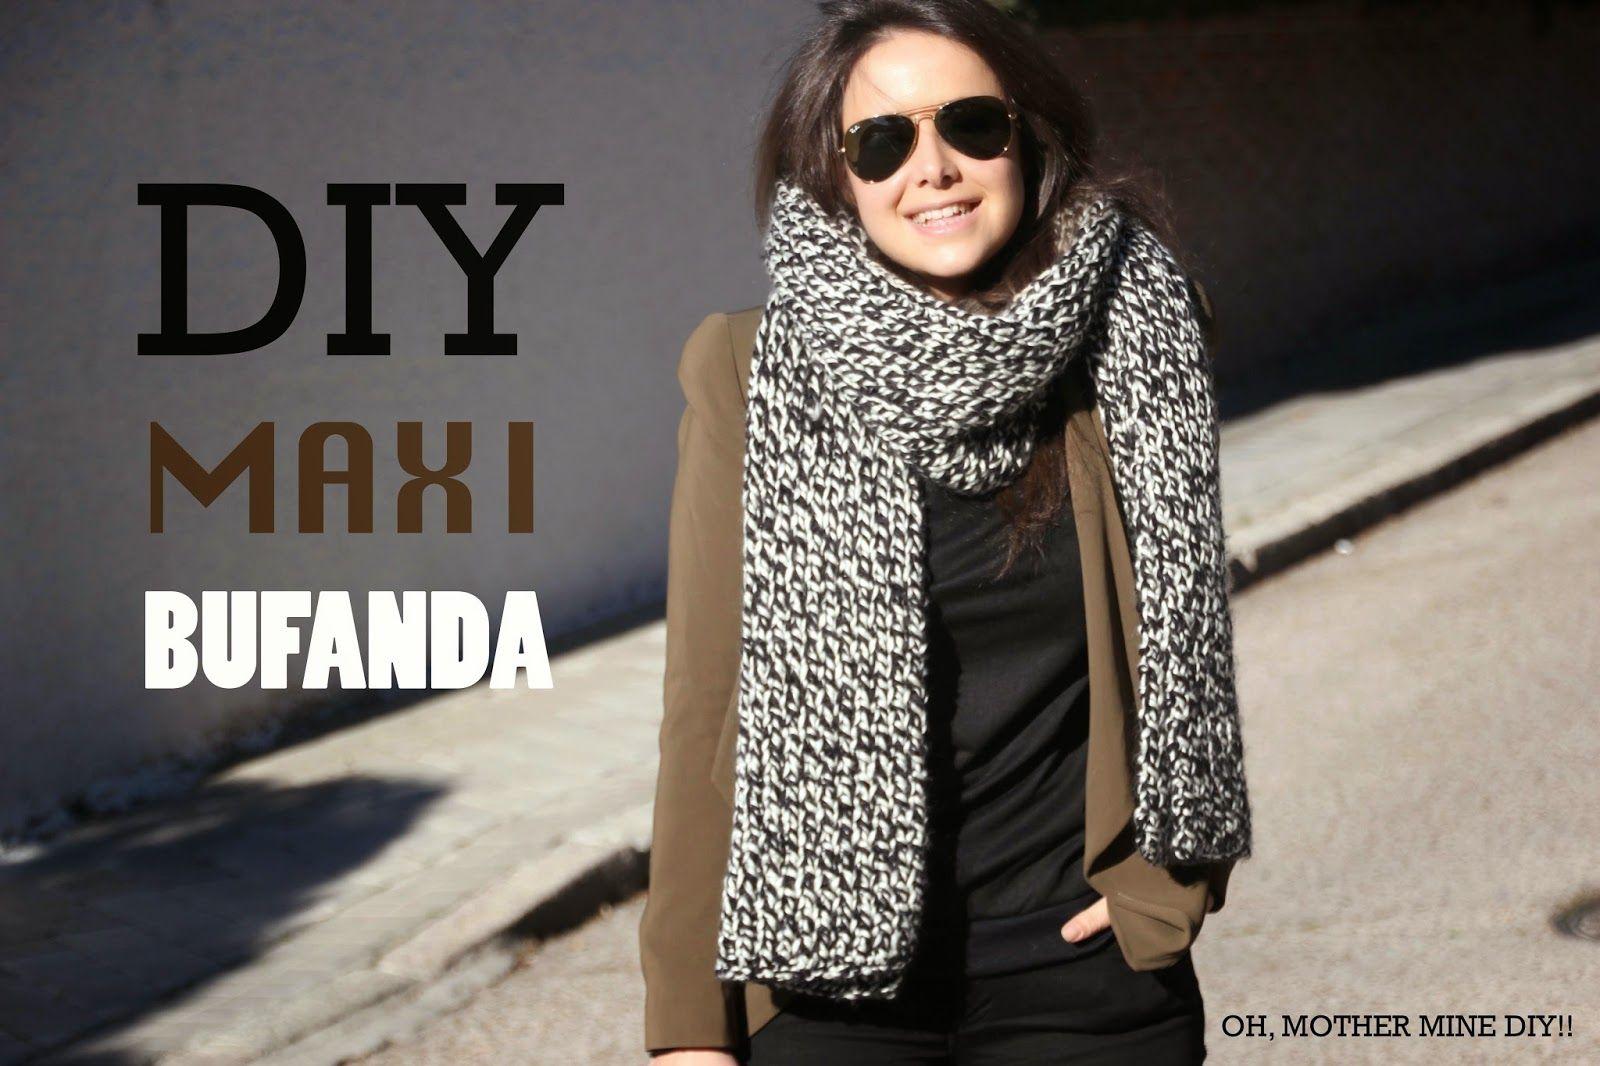 Tutorial: Un maxi bufanda DIY | Fabric craft - Crochet - Telas e ...